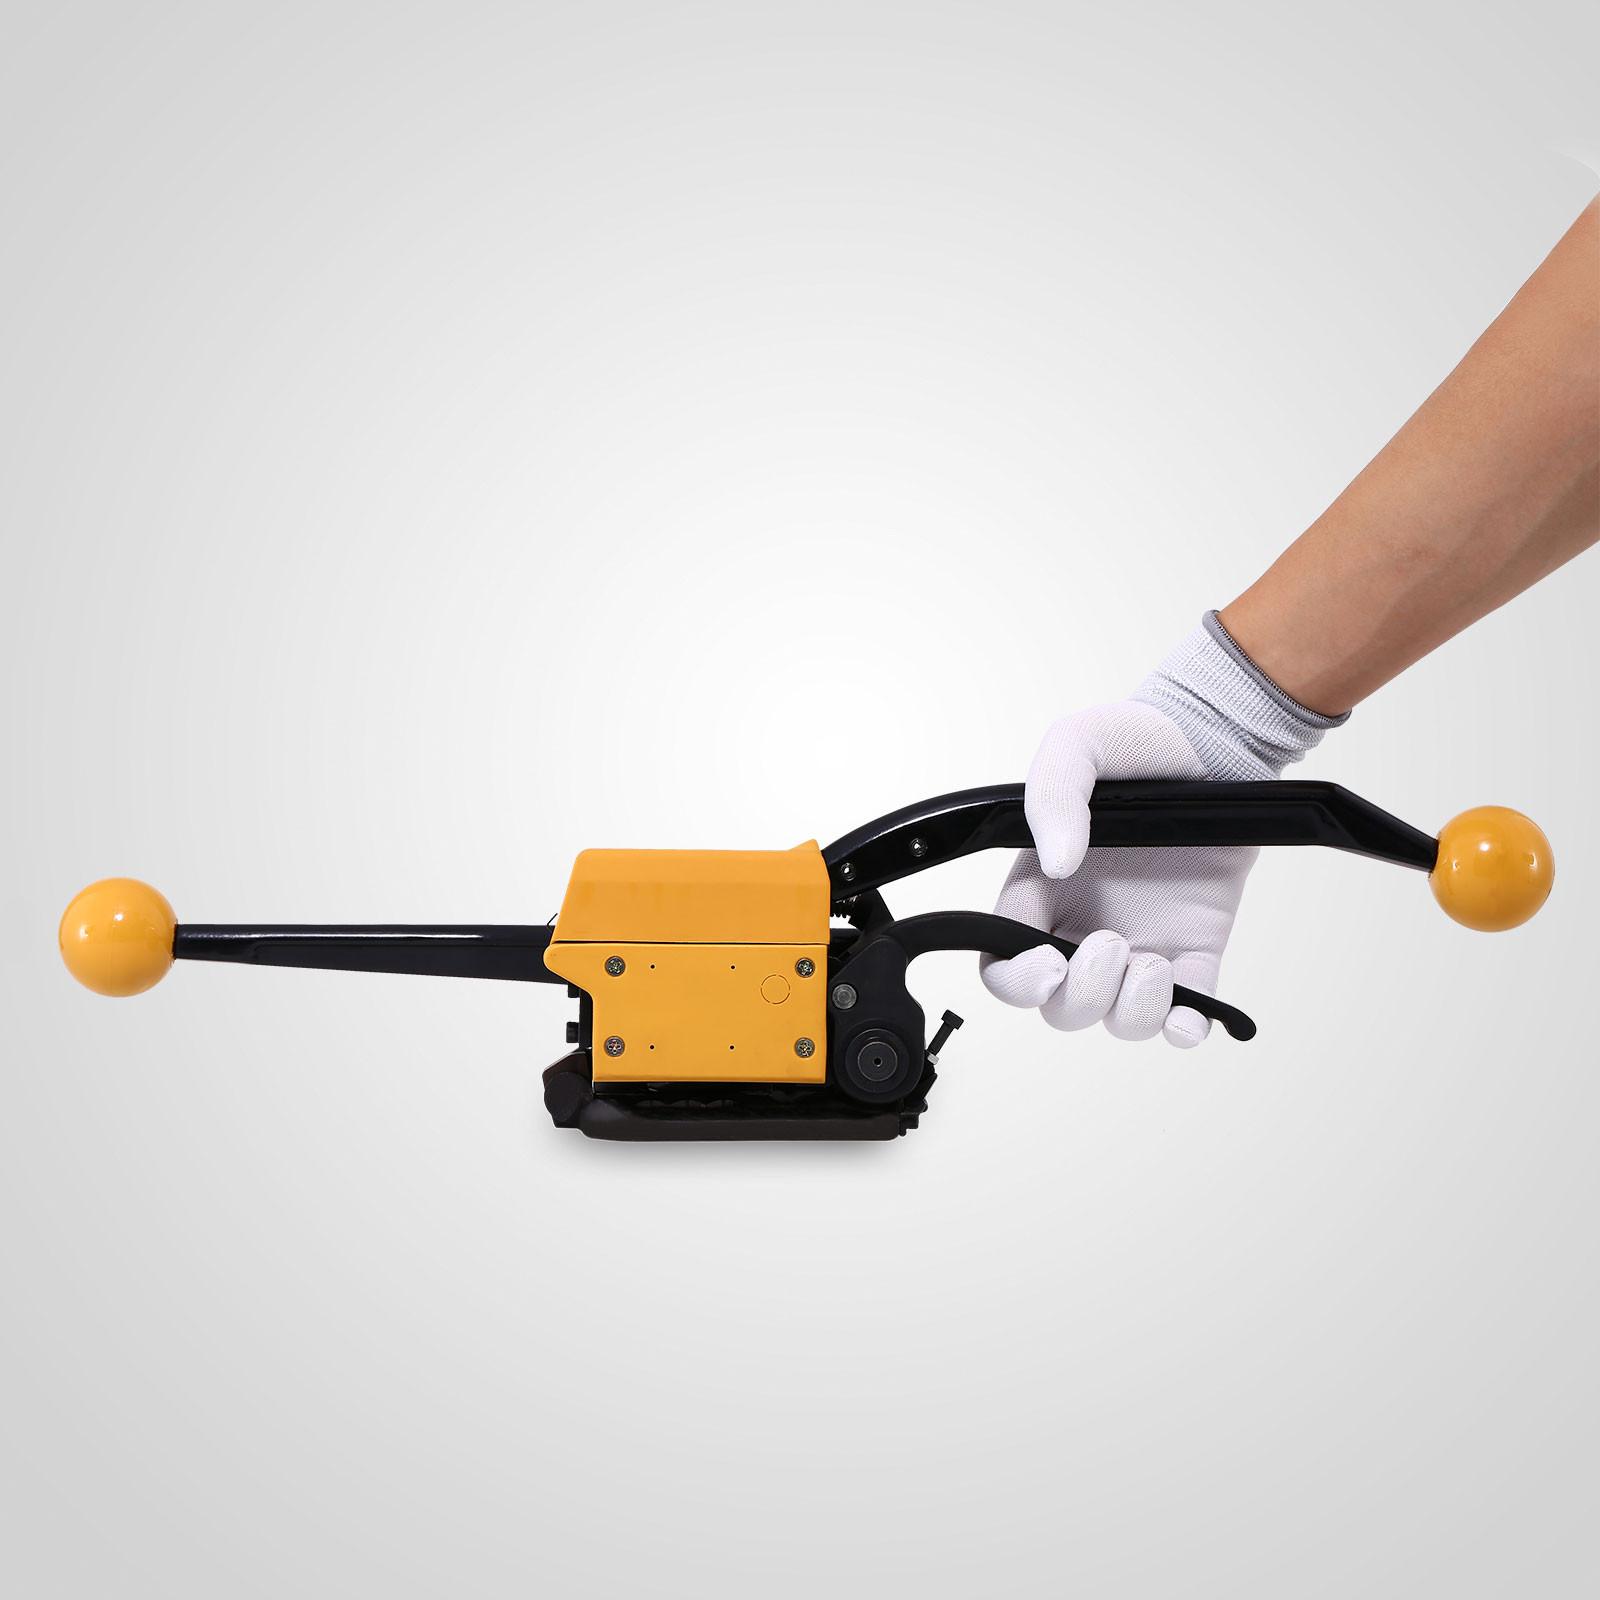 Stahlband umreifungsband Umreifungsgerät bandspanner hülsenlos Strapping Tool de